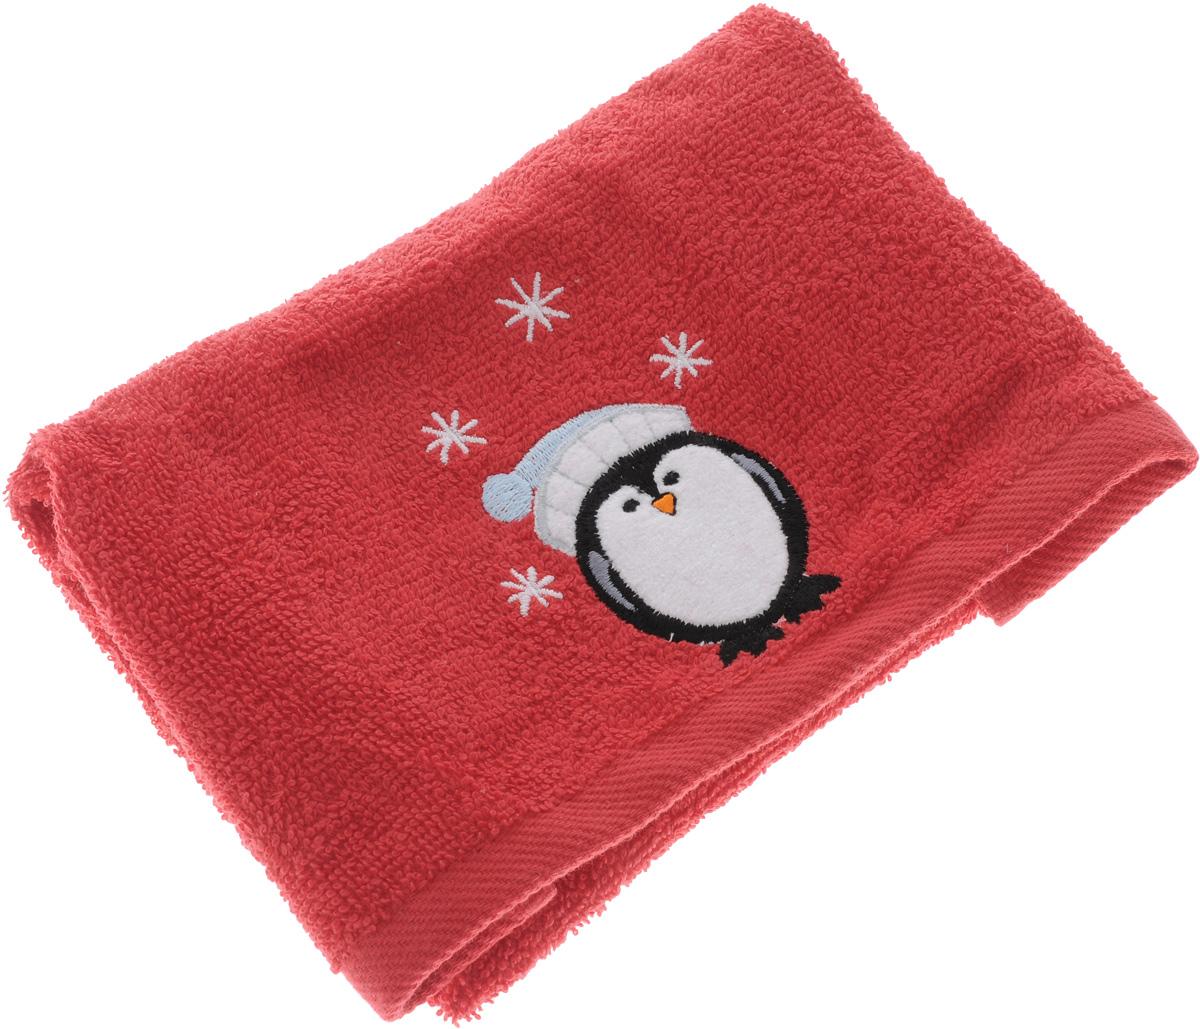 "Полотенце подарочное Coronet ""Пингвин"", 45 х 30 см"